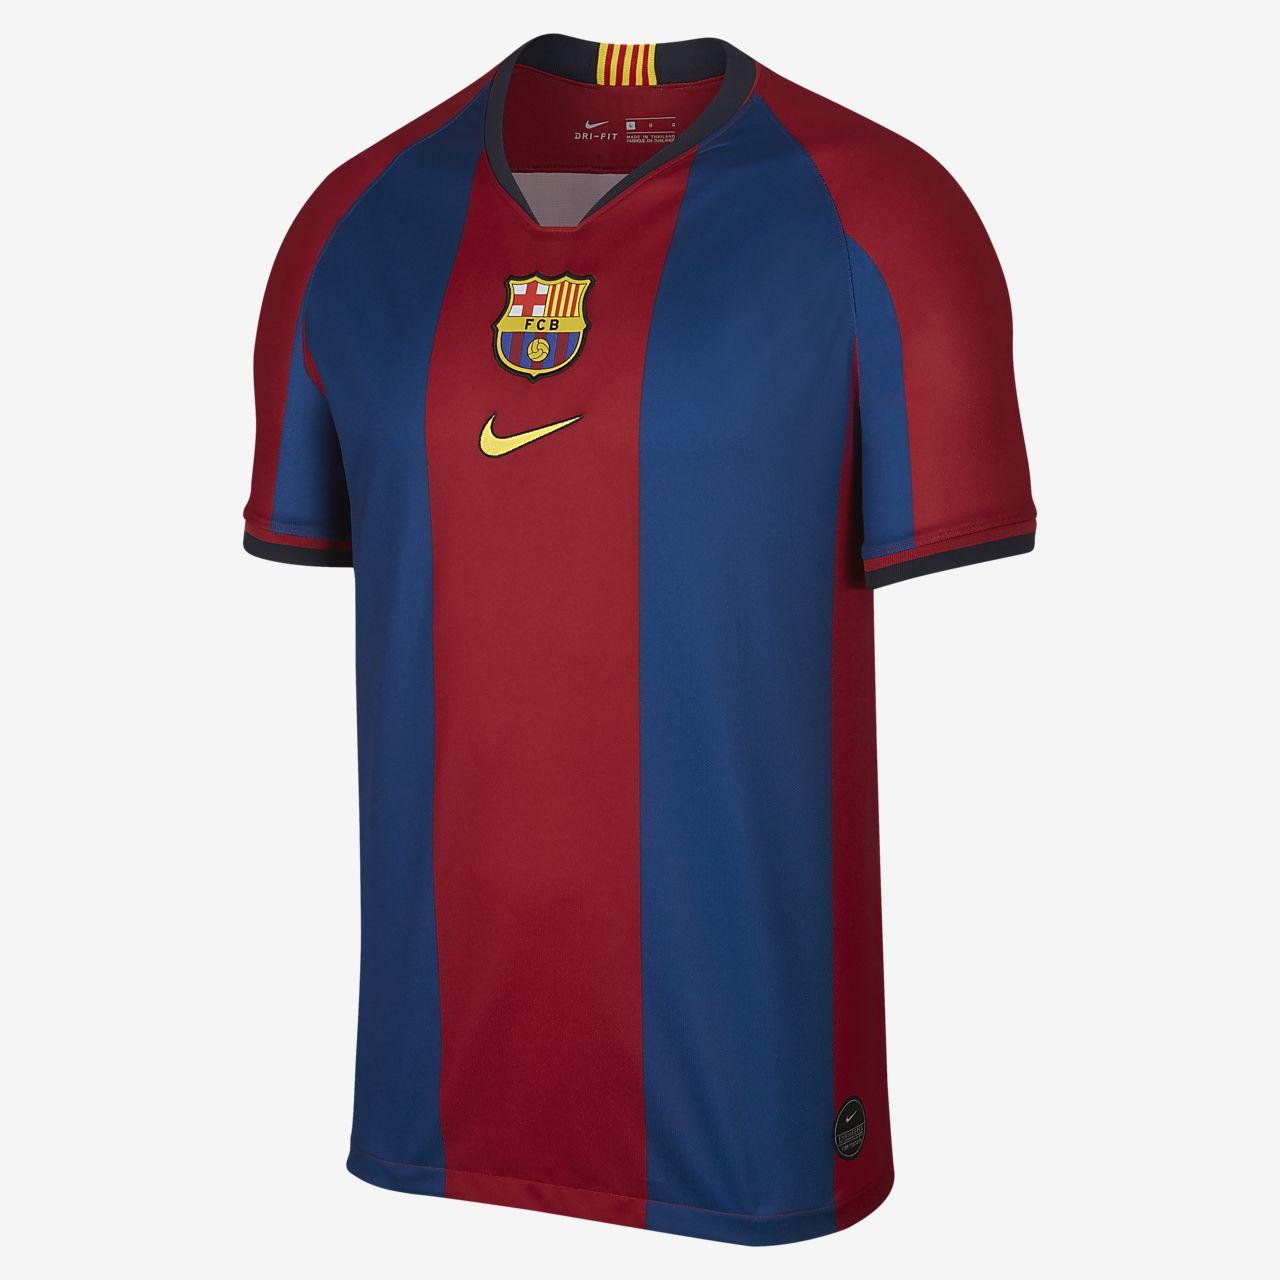 Camiseta para hombre FC Barcelona Stadium '98/99